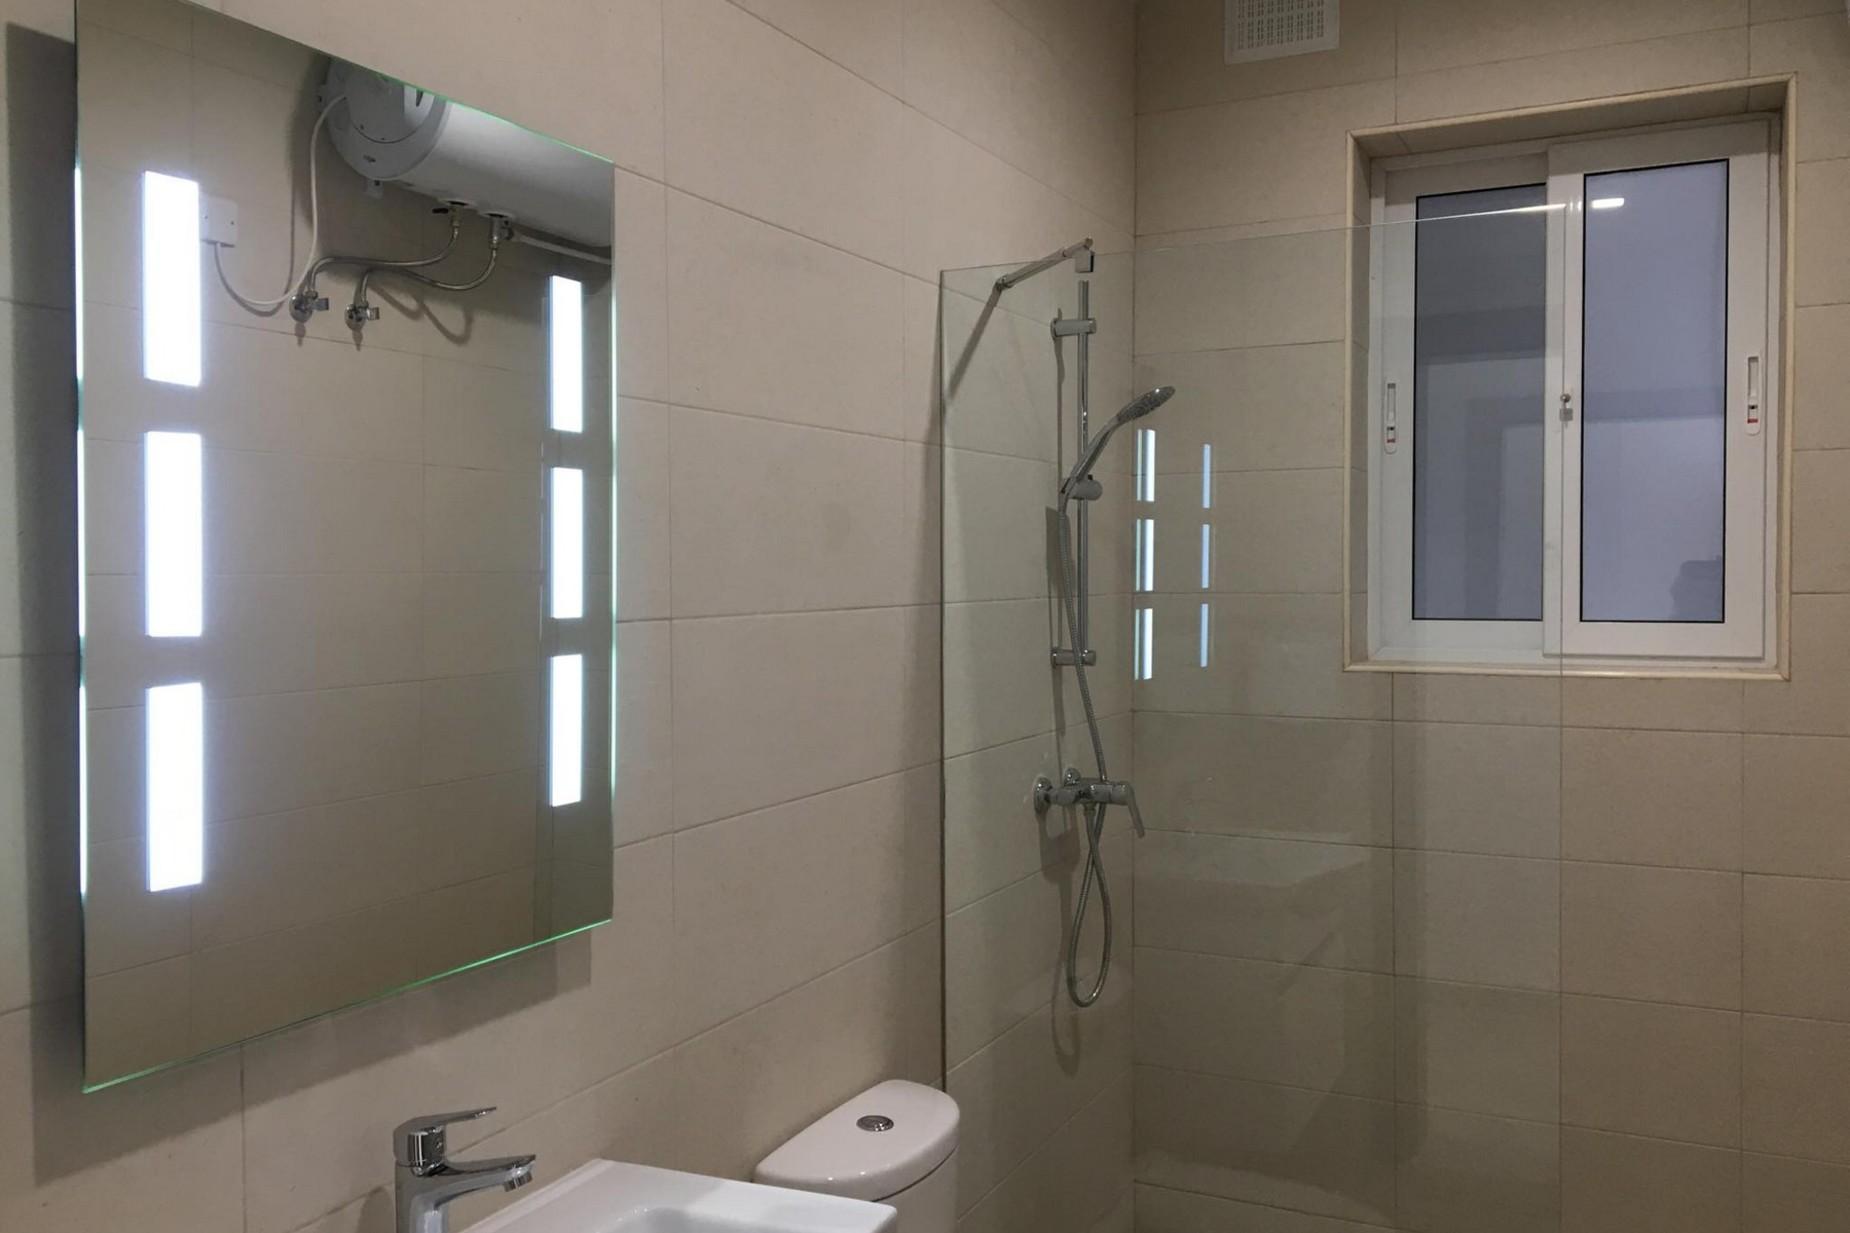 0 bed Office For Rent in Gzira, Gzira - thumb 7